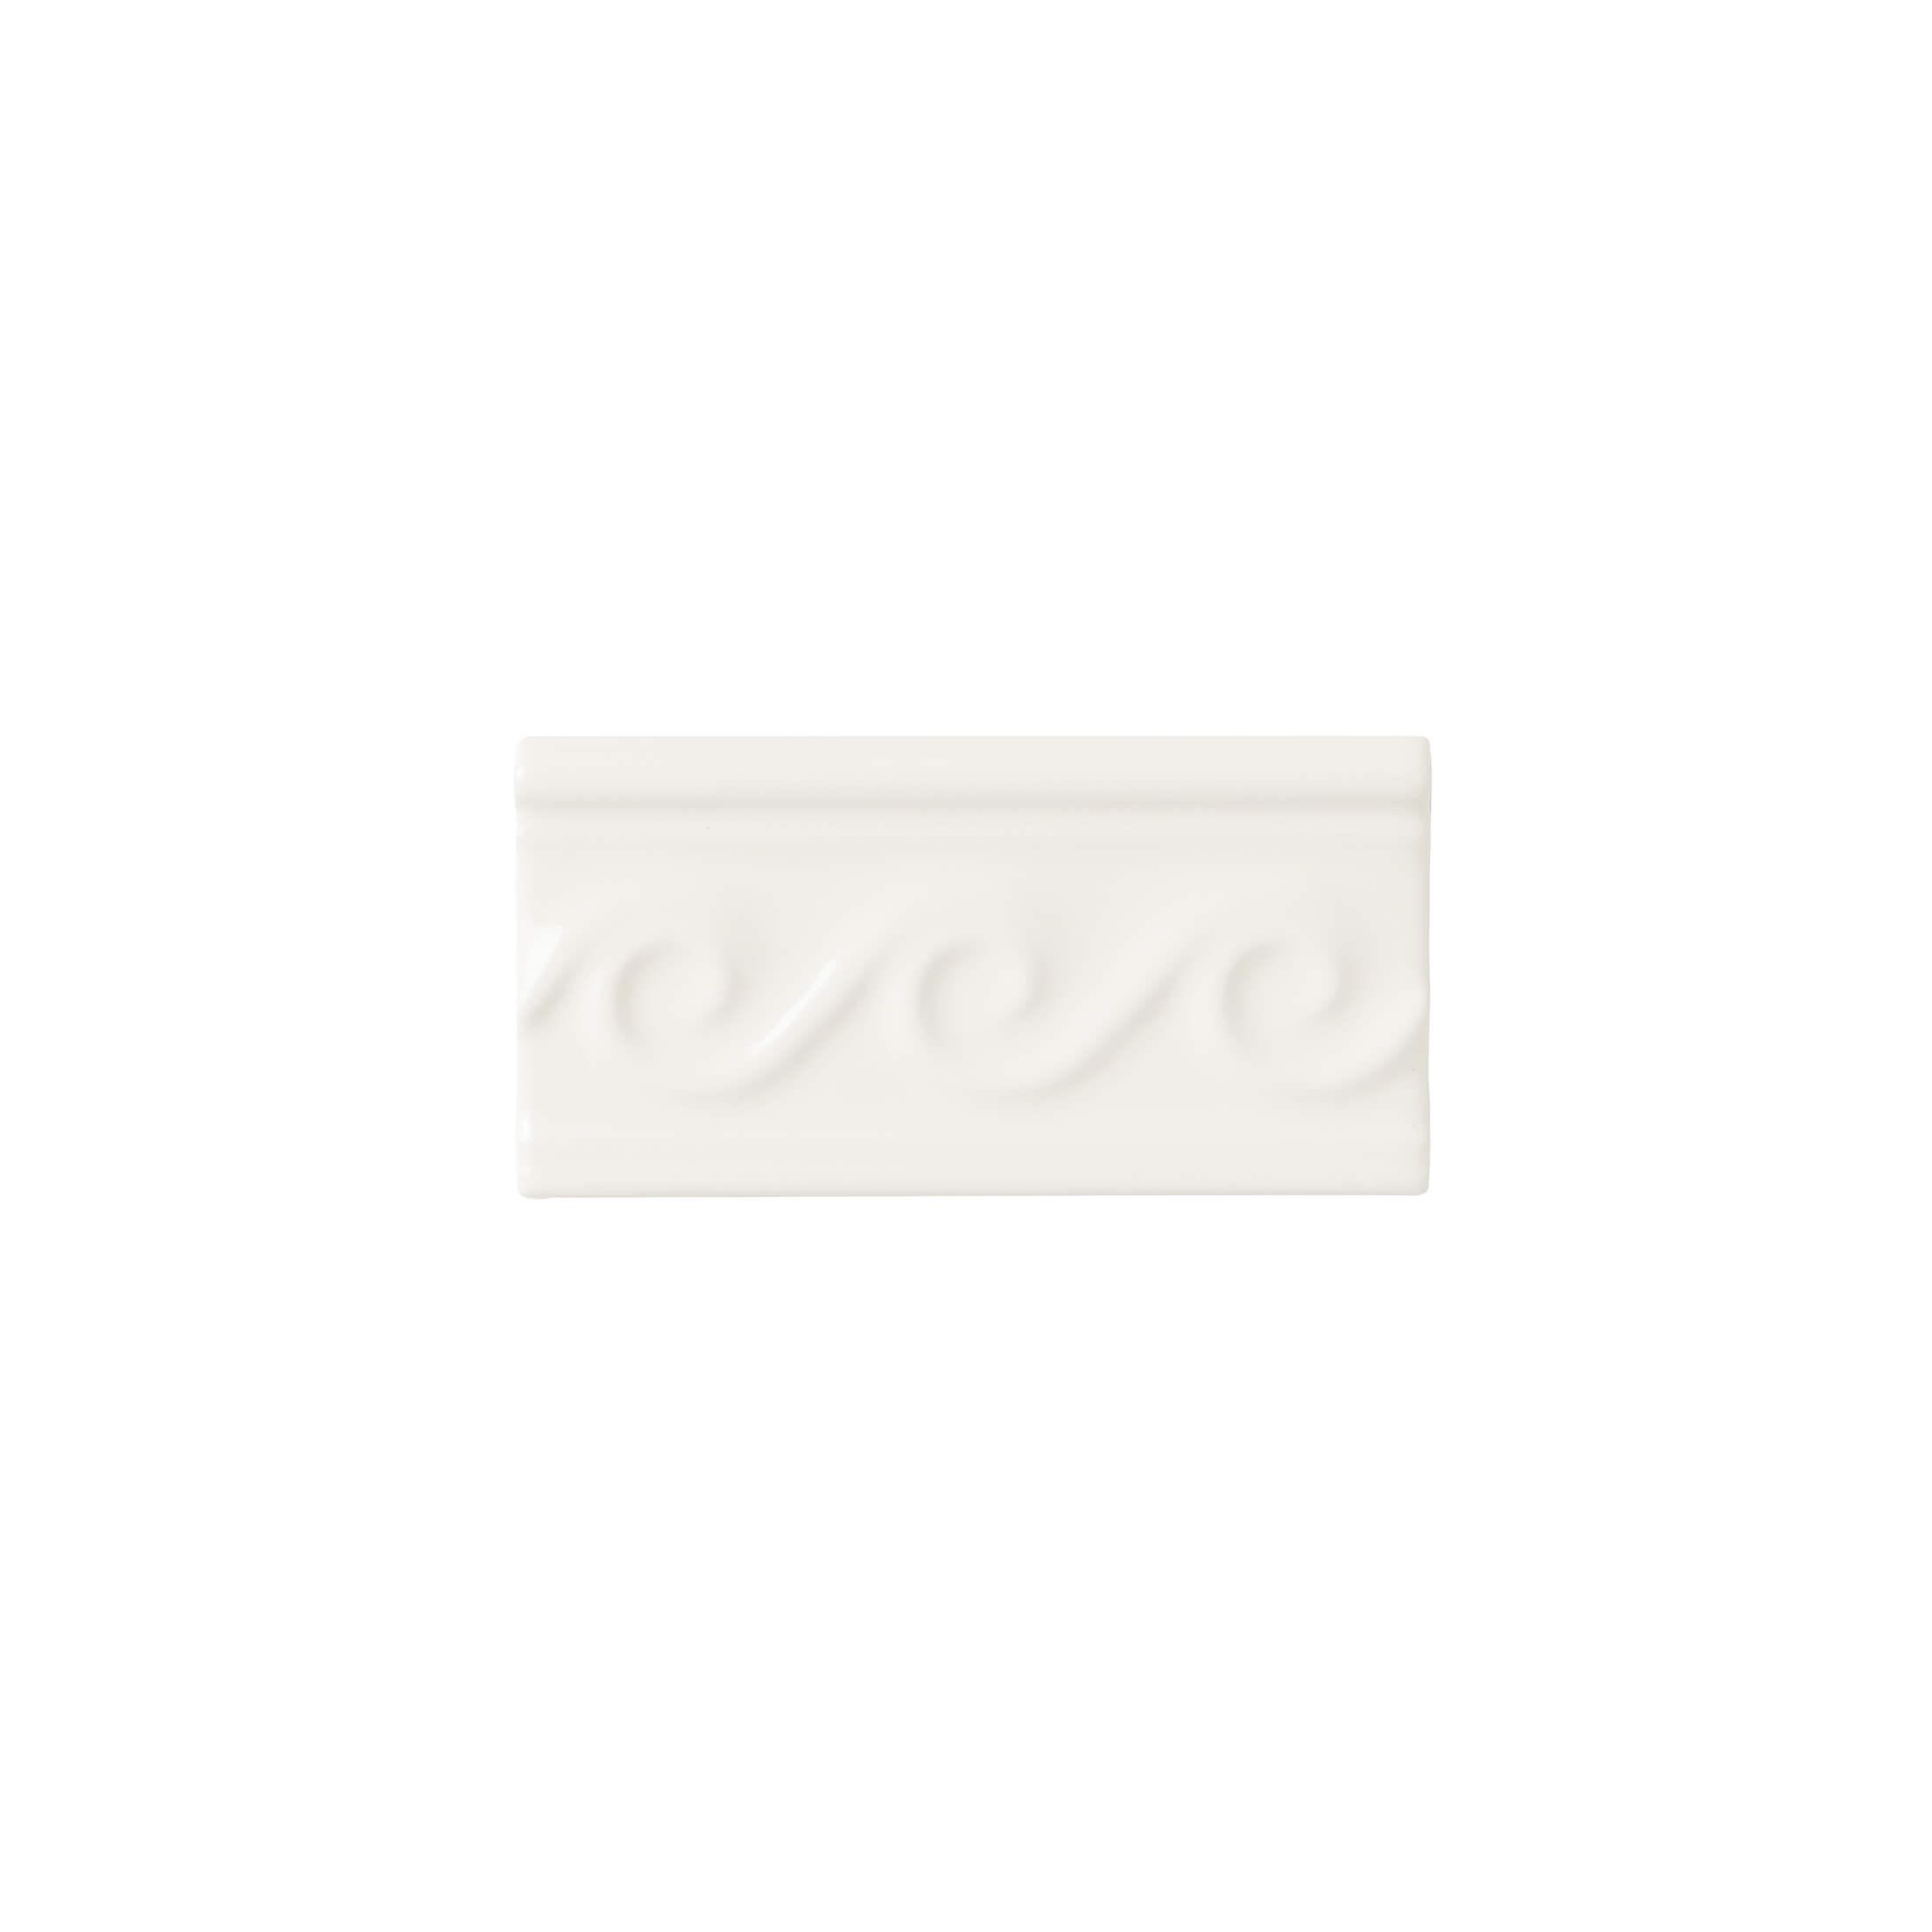 ADNE4067 - RELIEVE OLAS PB - 7.5 cm X 15 cm